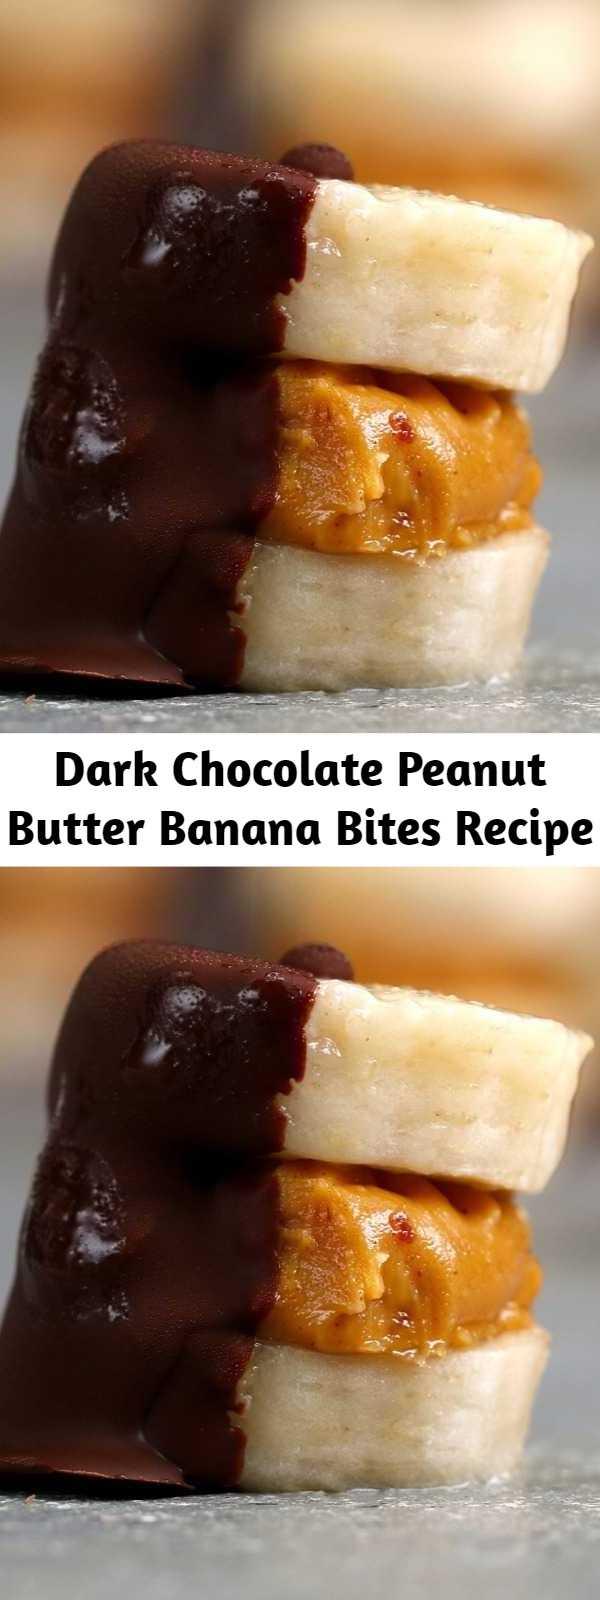 Dark Chocolate Peanut Butter Banana Bites Recipe - These Dark Chocolate Peanut Butter Banana Bites are everything.